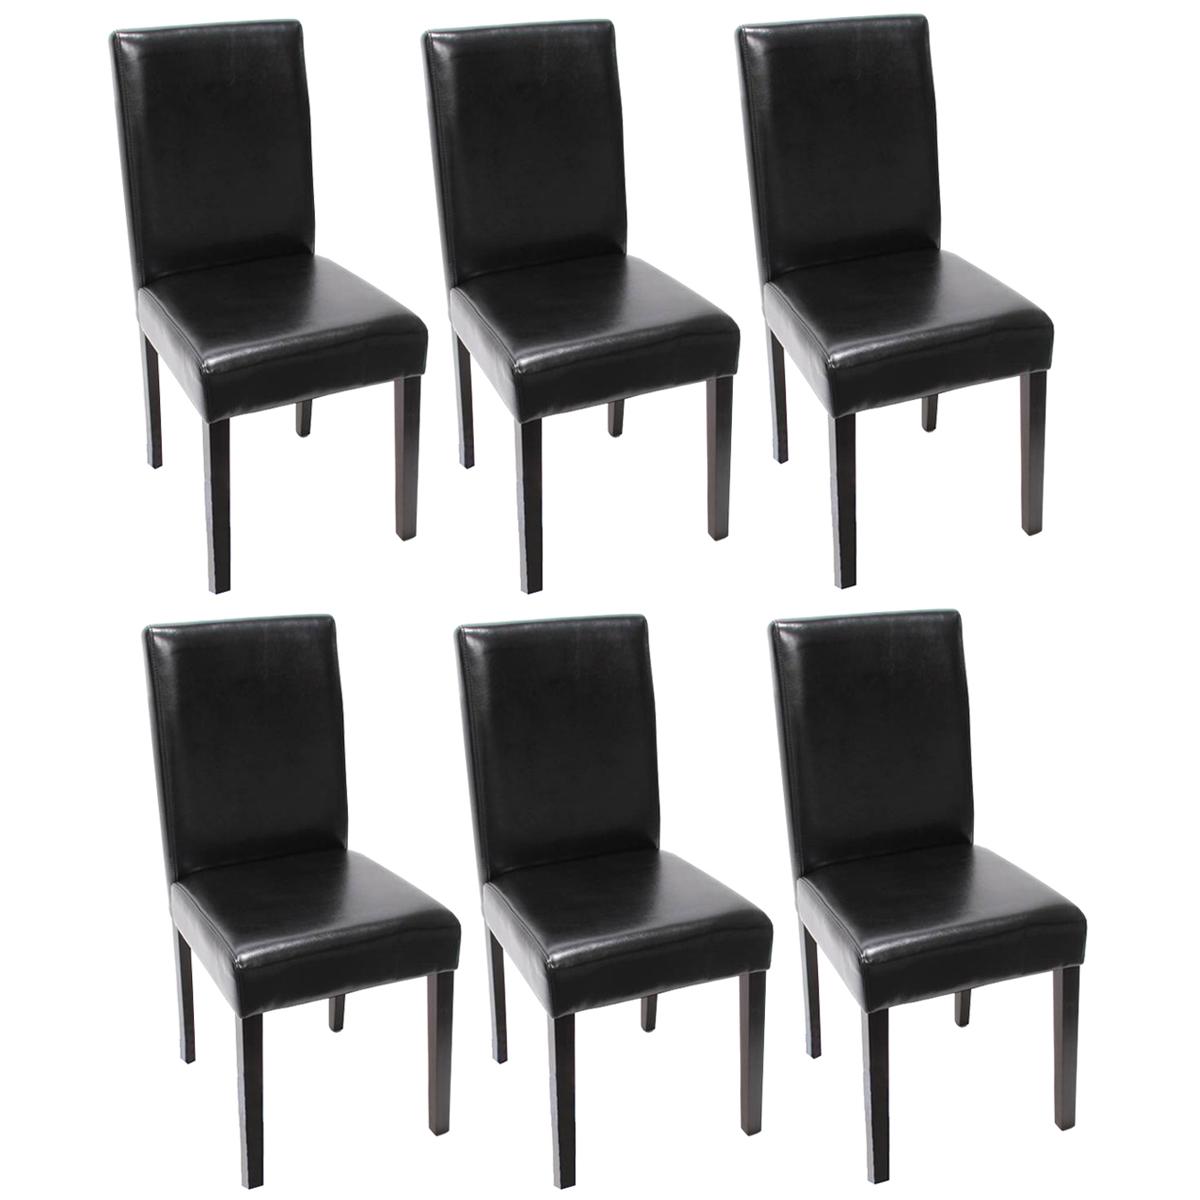 6x esszimmerstuhl littau leder schwarz dunkle beine. Black Bedroom Furniture Sets. Home Design Ideas